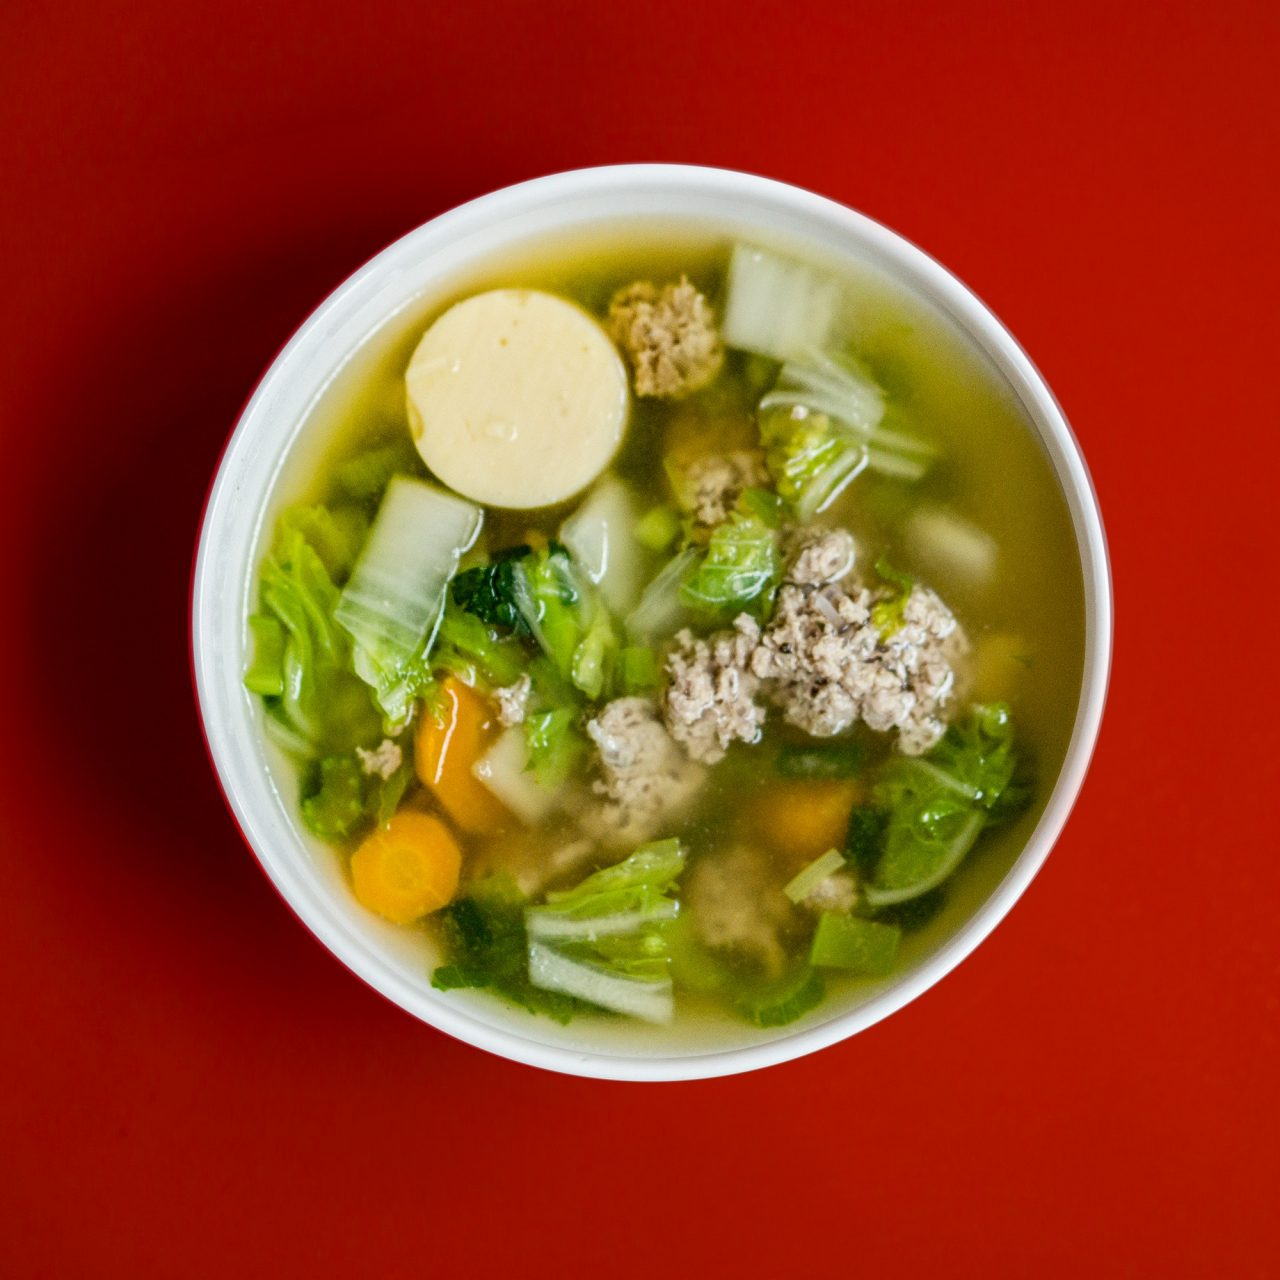 appetizer-asian-food-bowl-772518